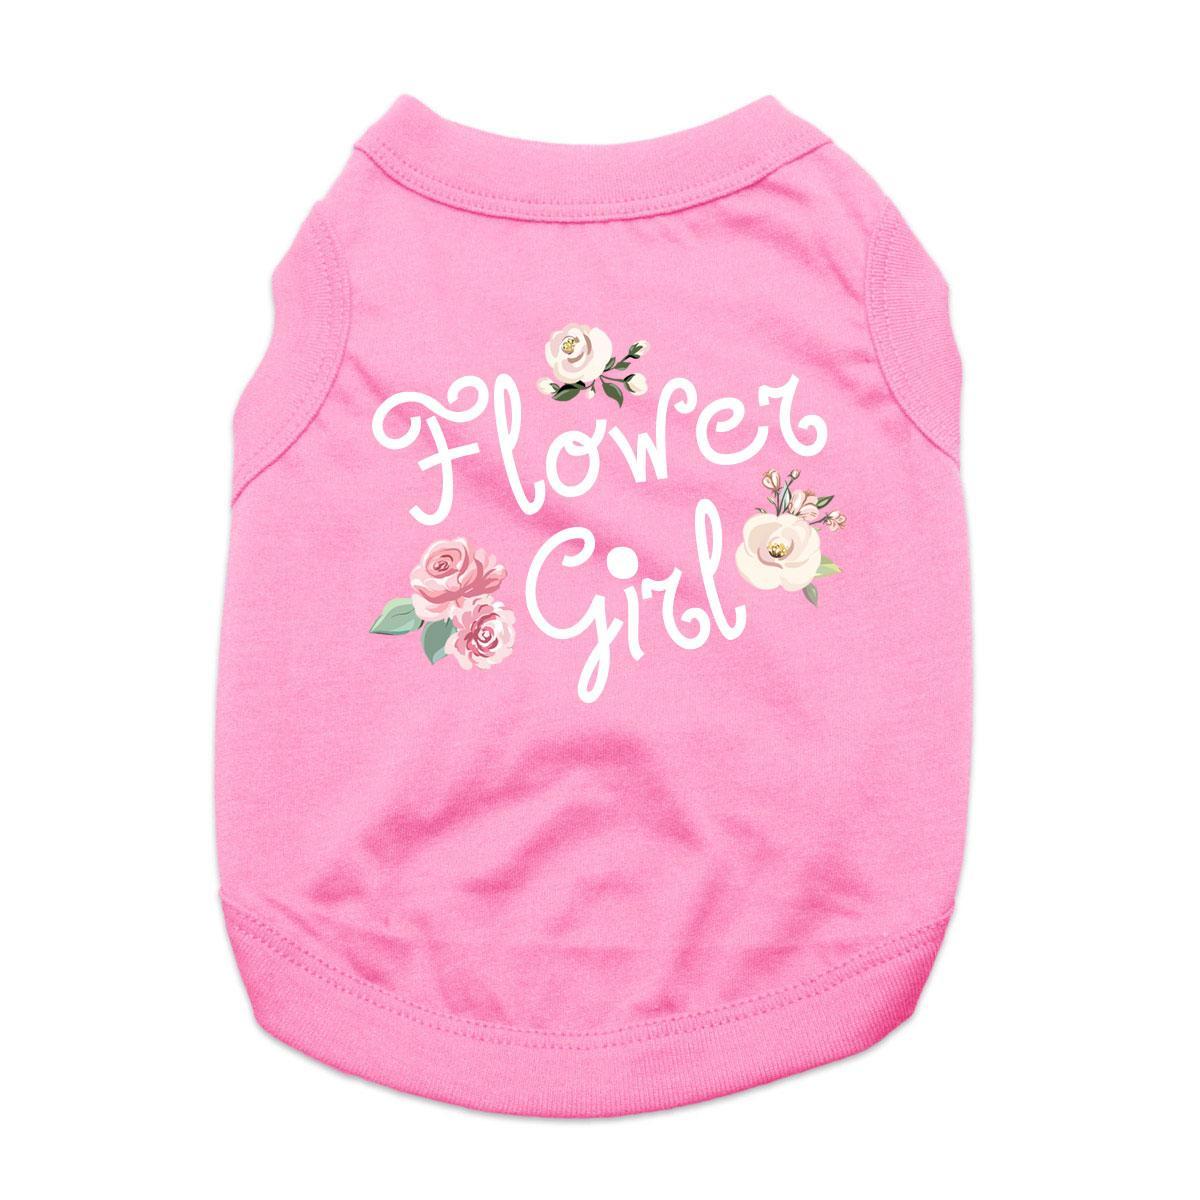 Flower Girl Dog Shirt - Light Pink